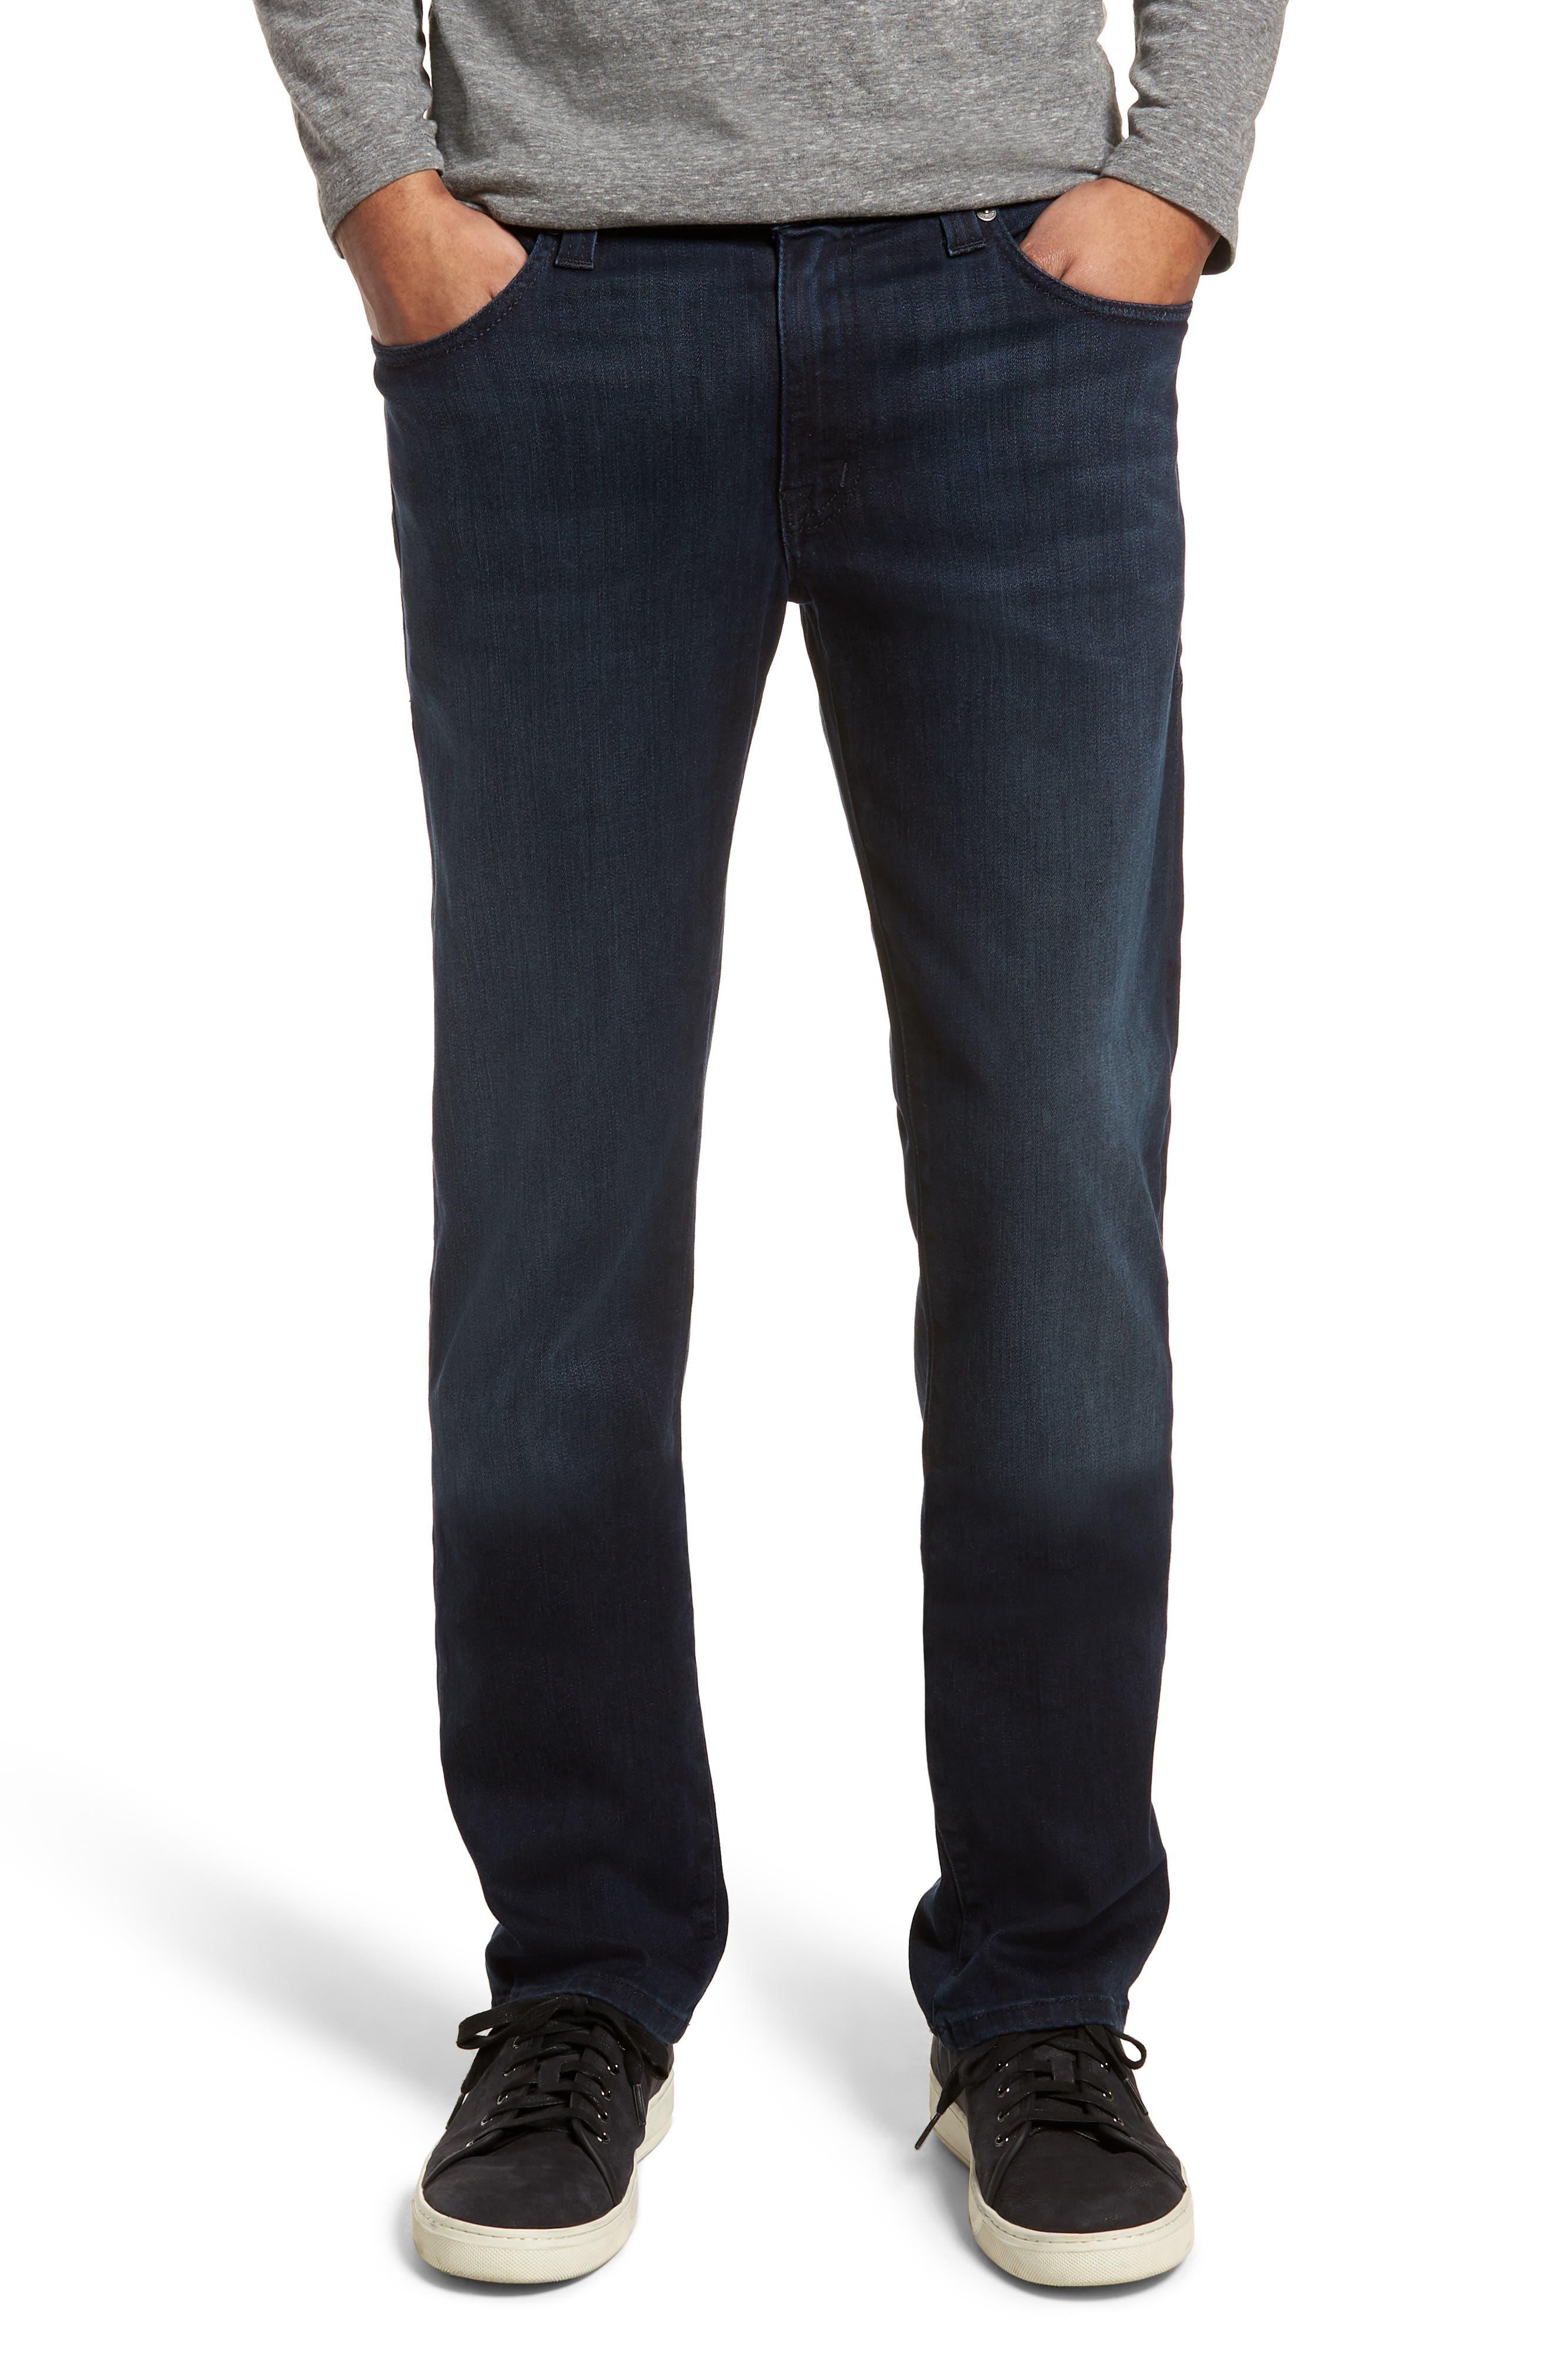 Fidelity Denim Jimmy Slim Straight Fit Jeans (Fade To Blue)